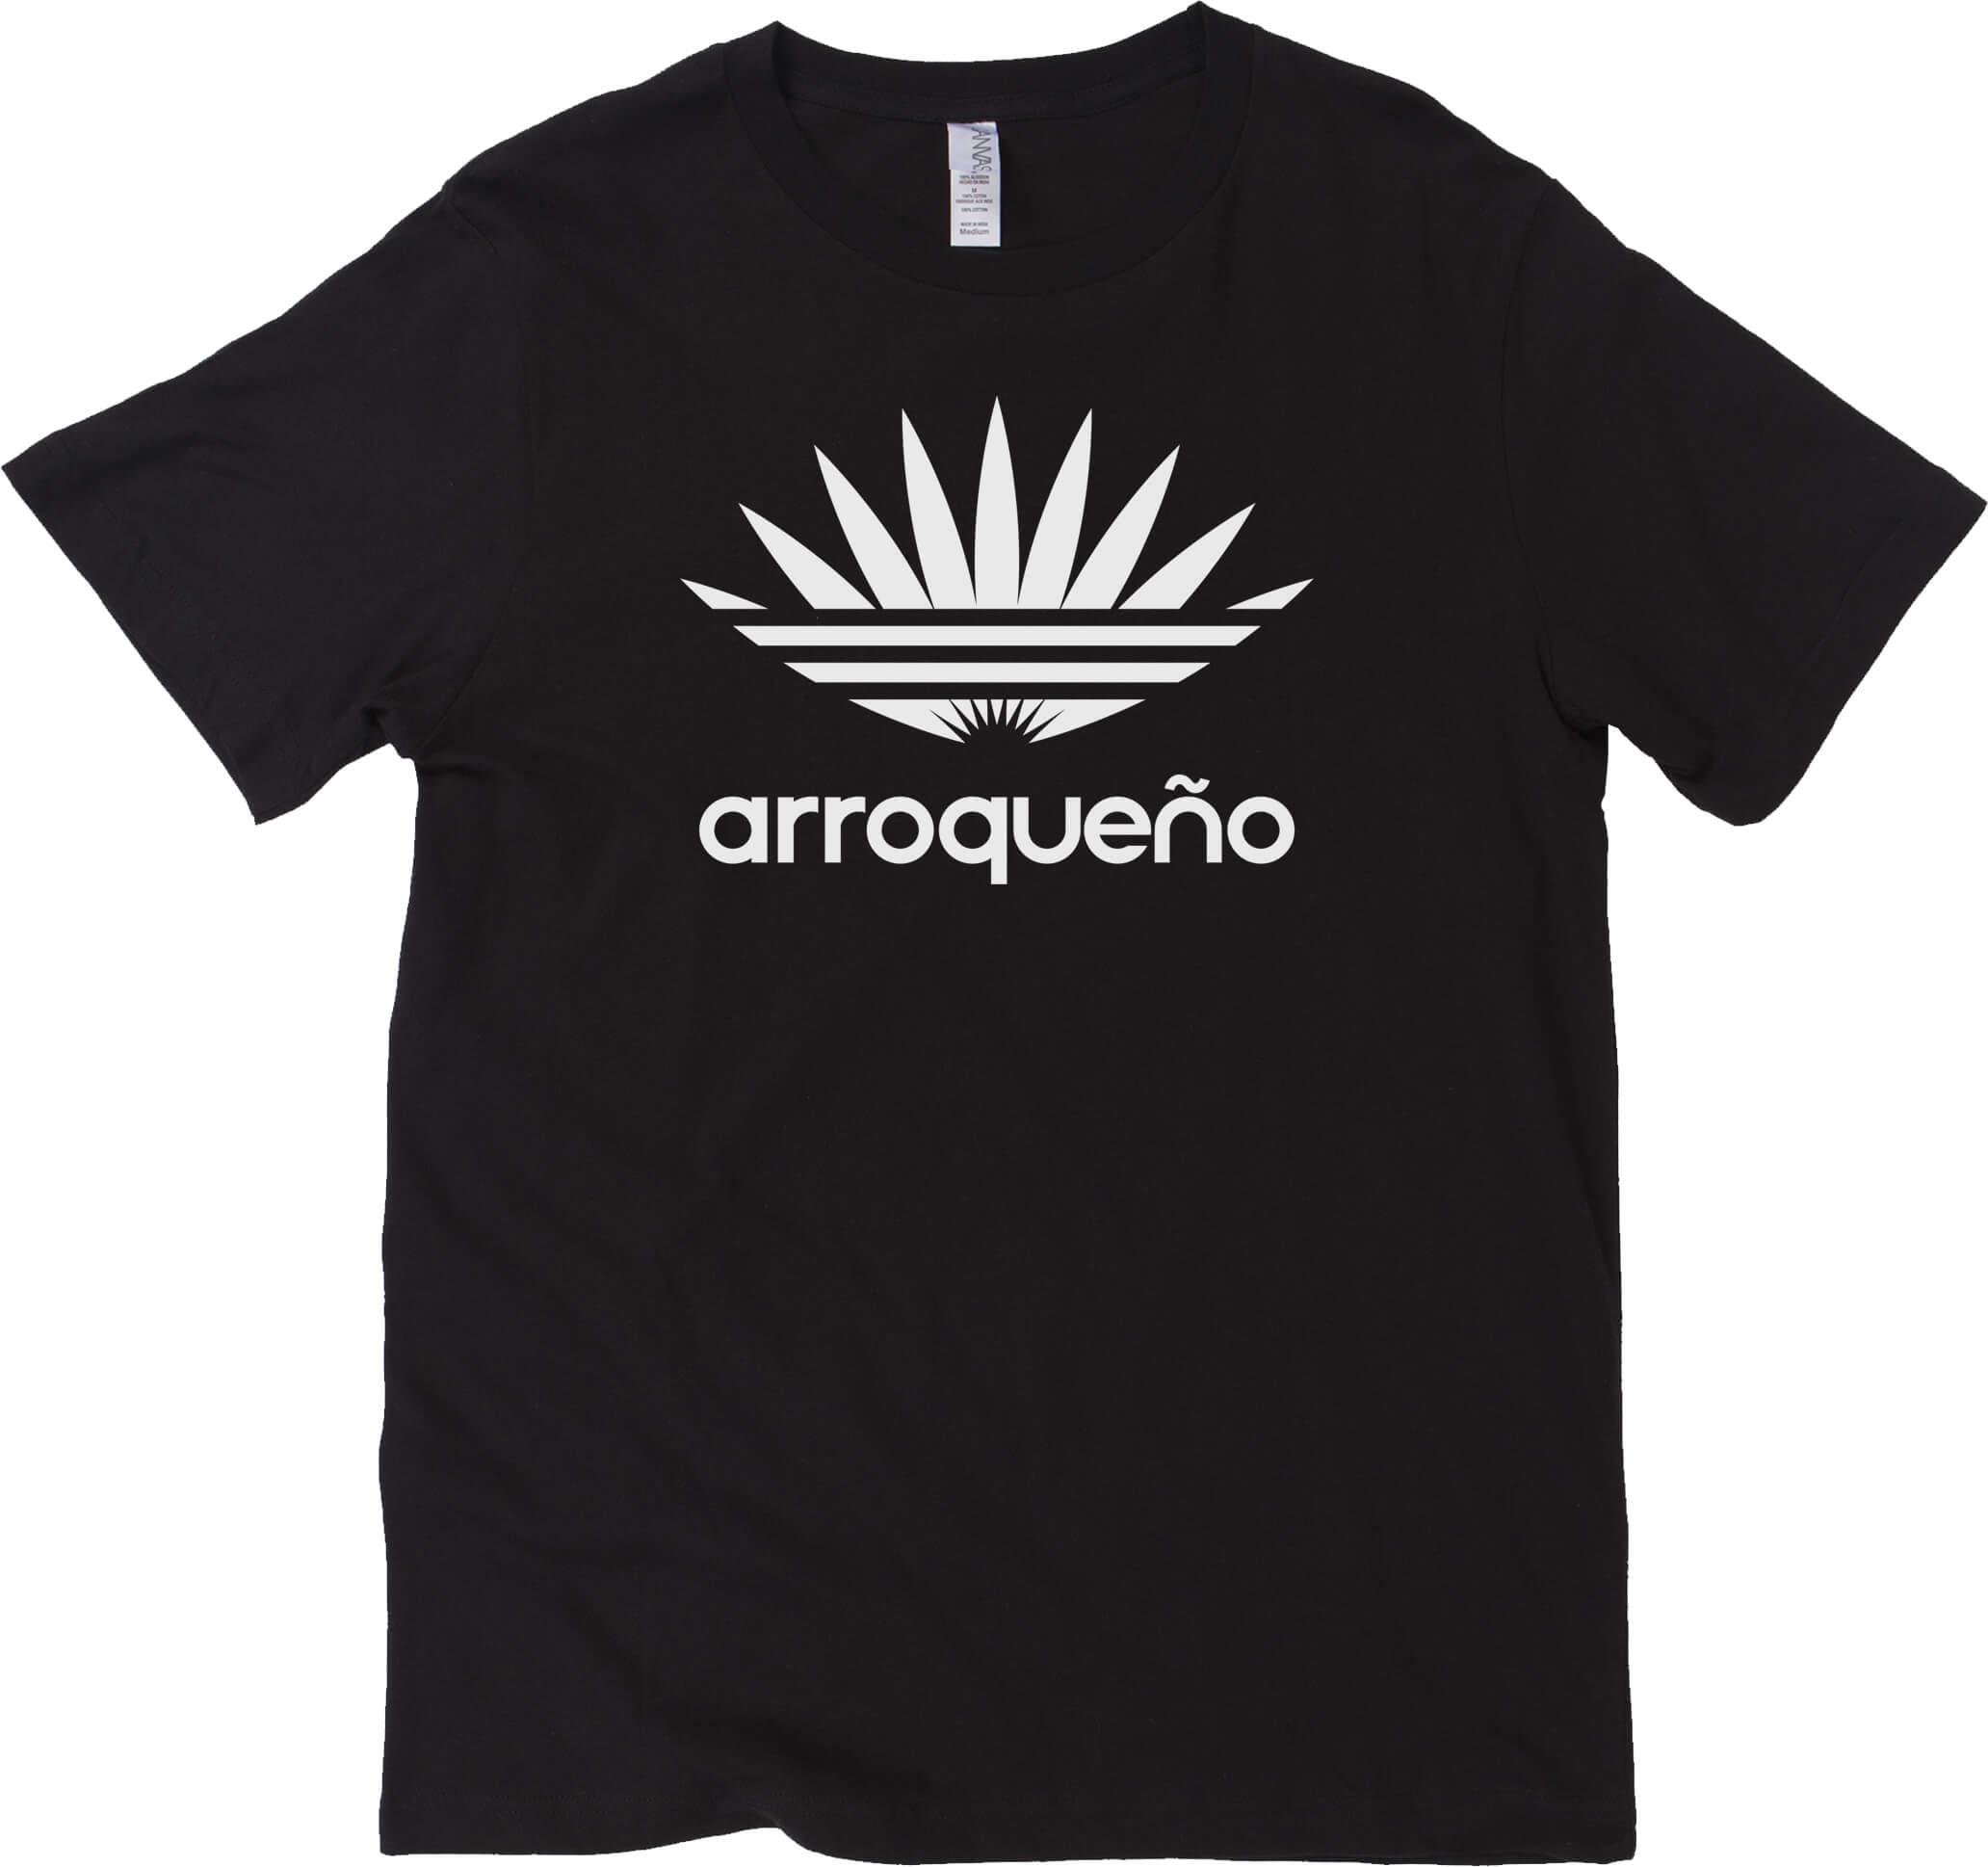 Arroqueño tee from Agaveholics